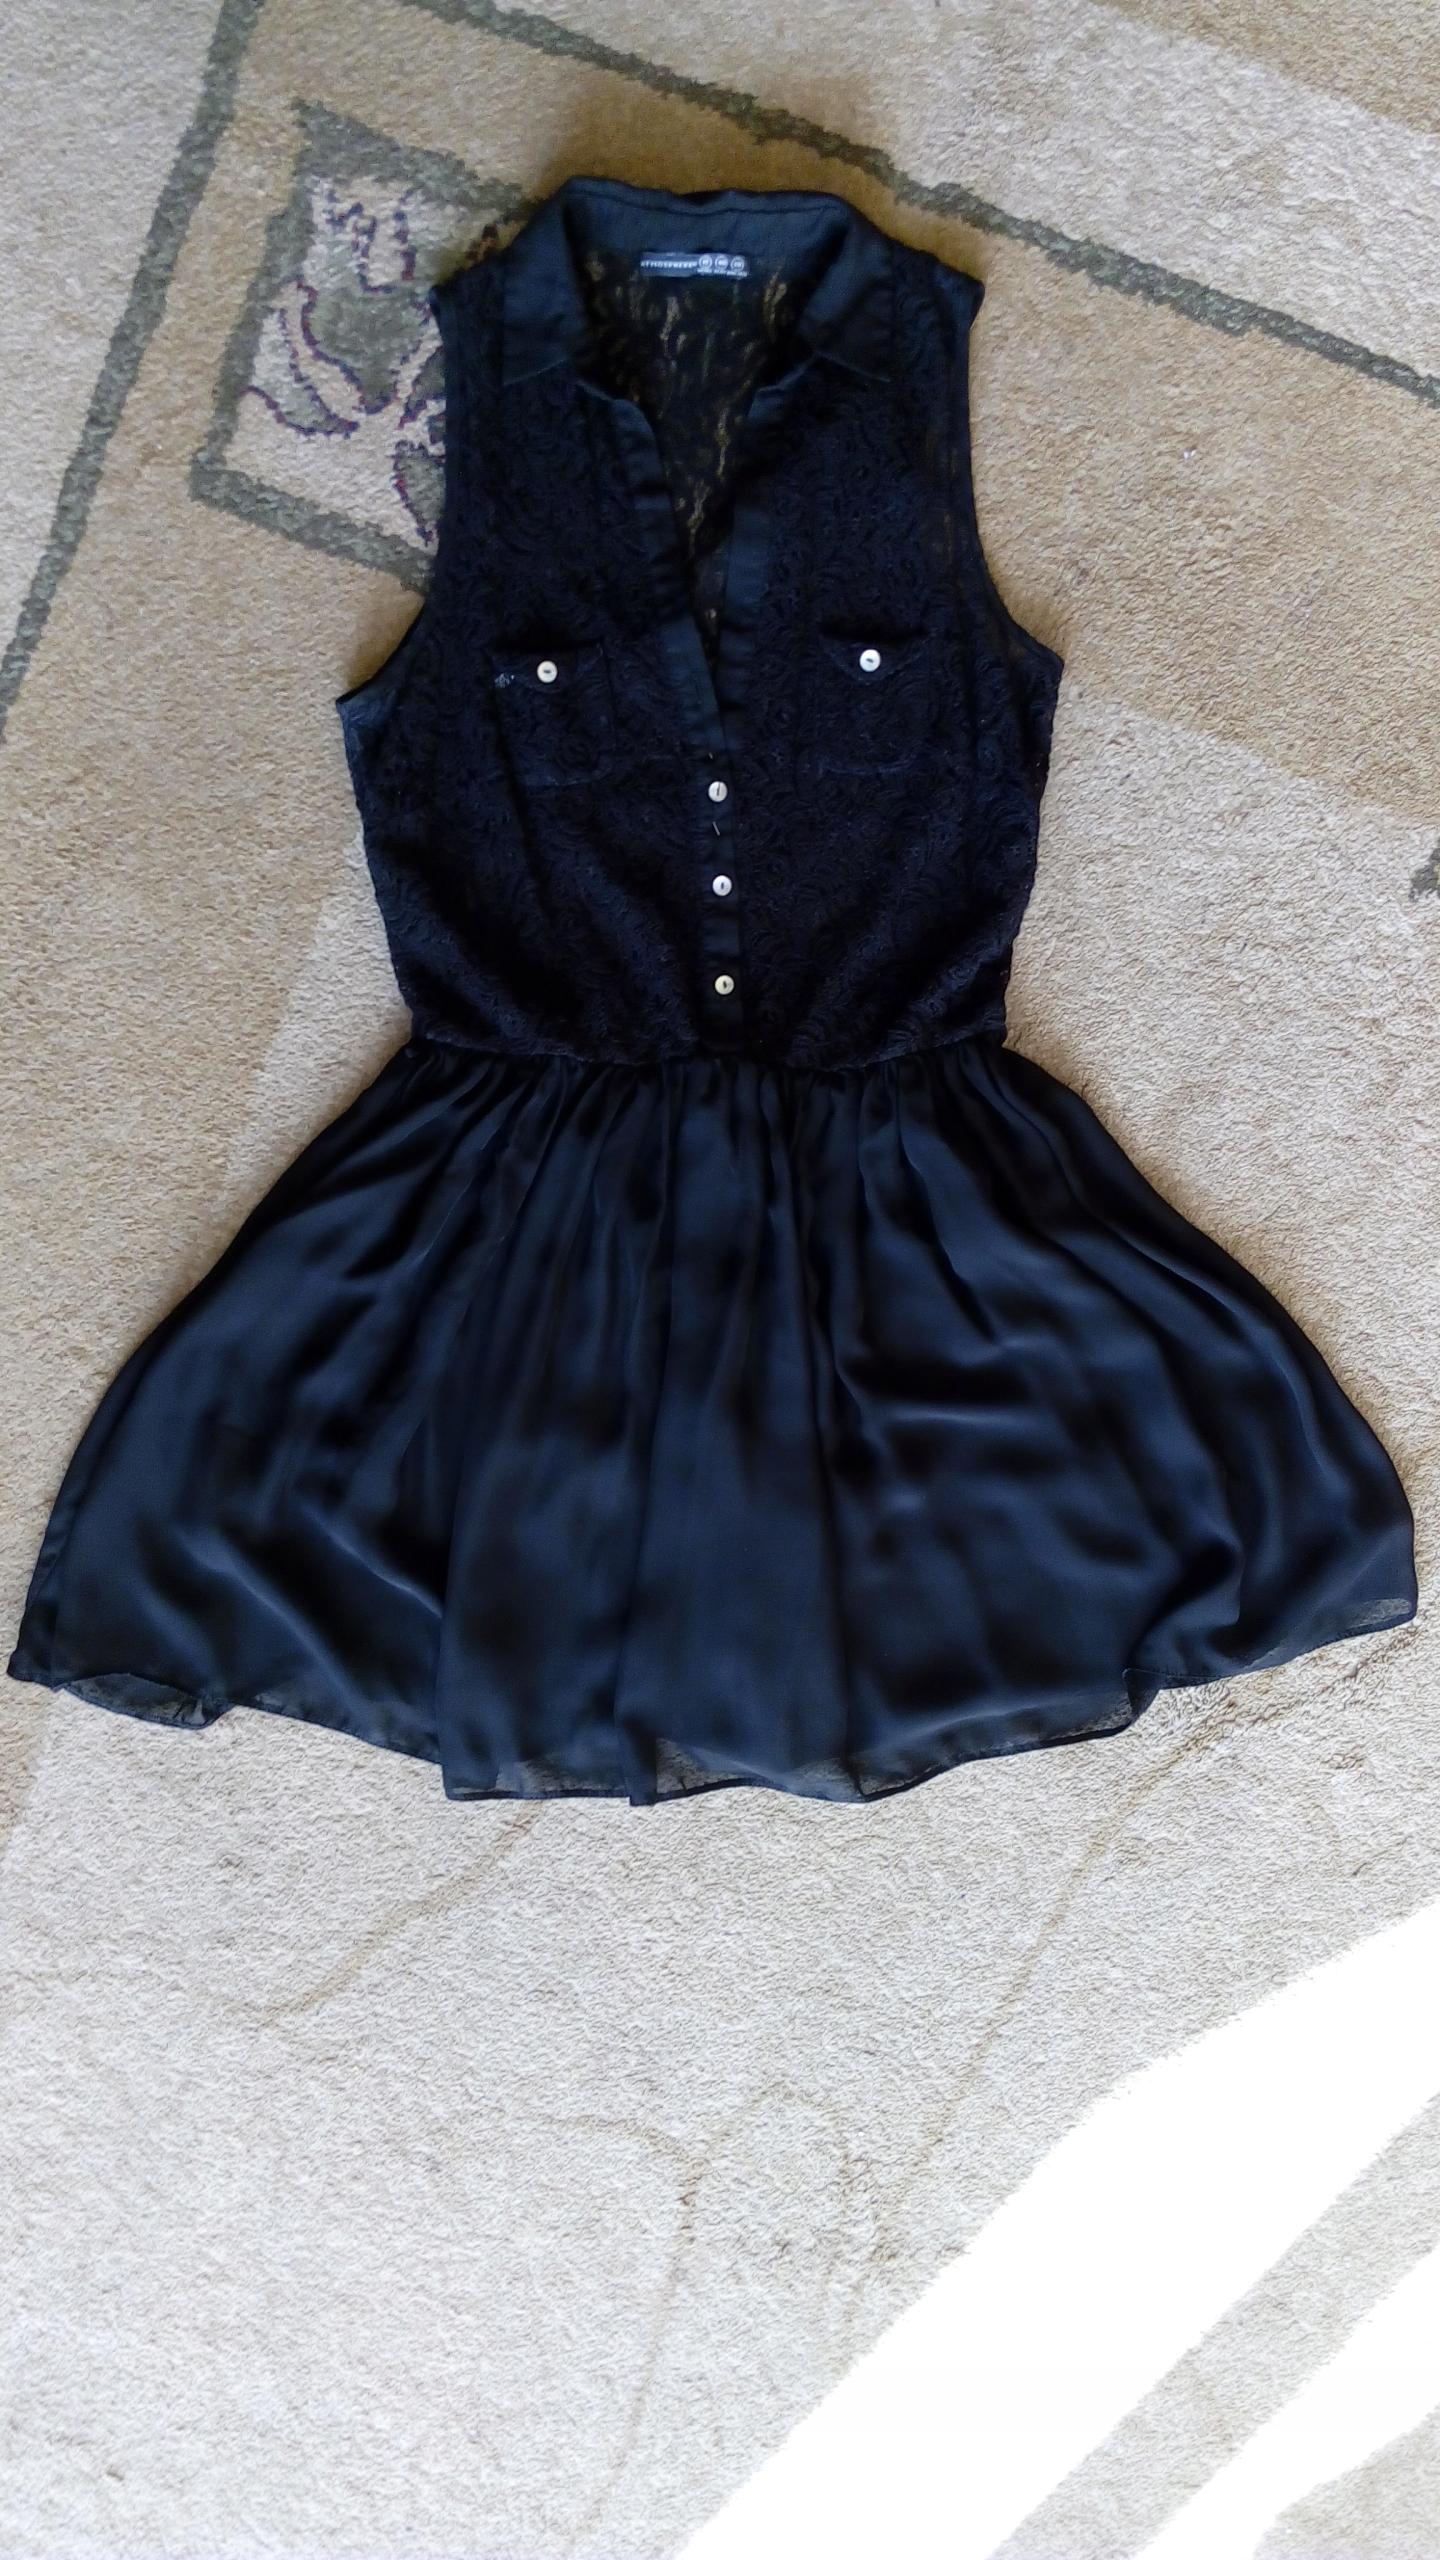 Atmosphere primark sukienka mgiełka czarna 40 L